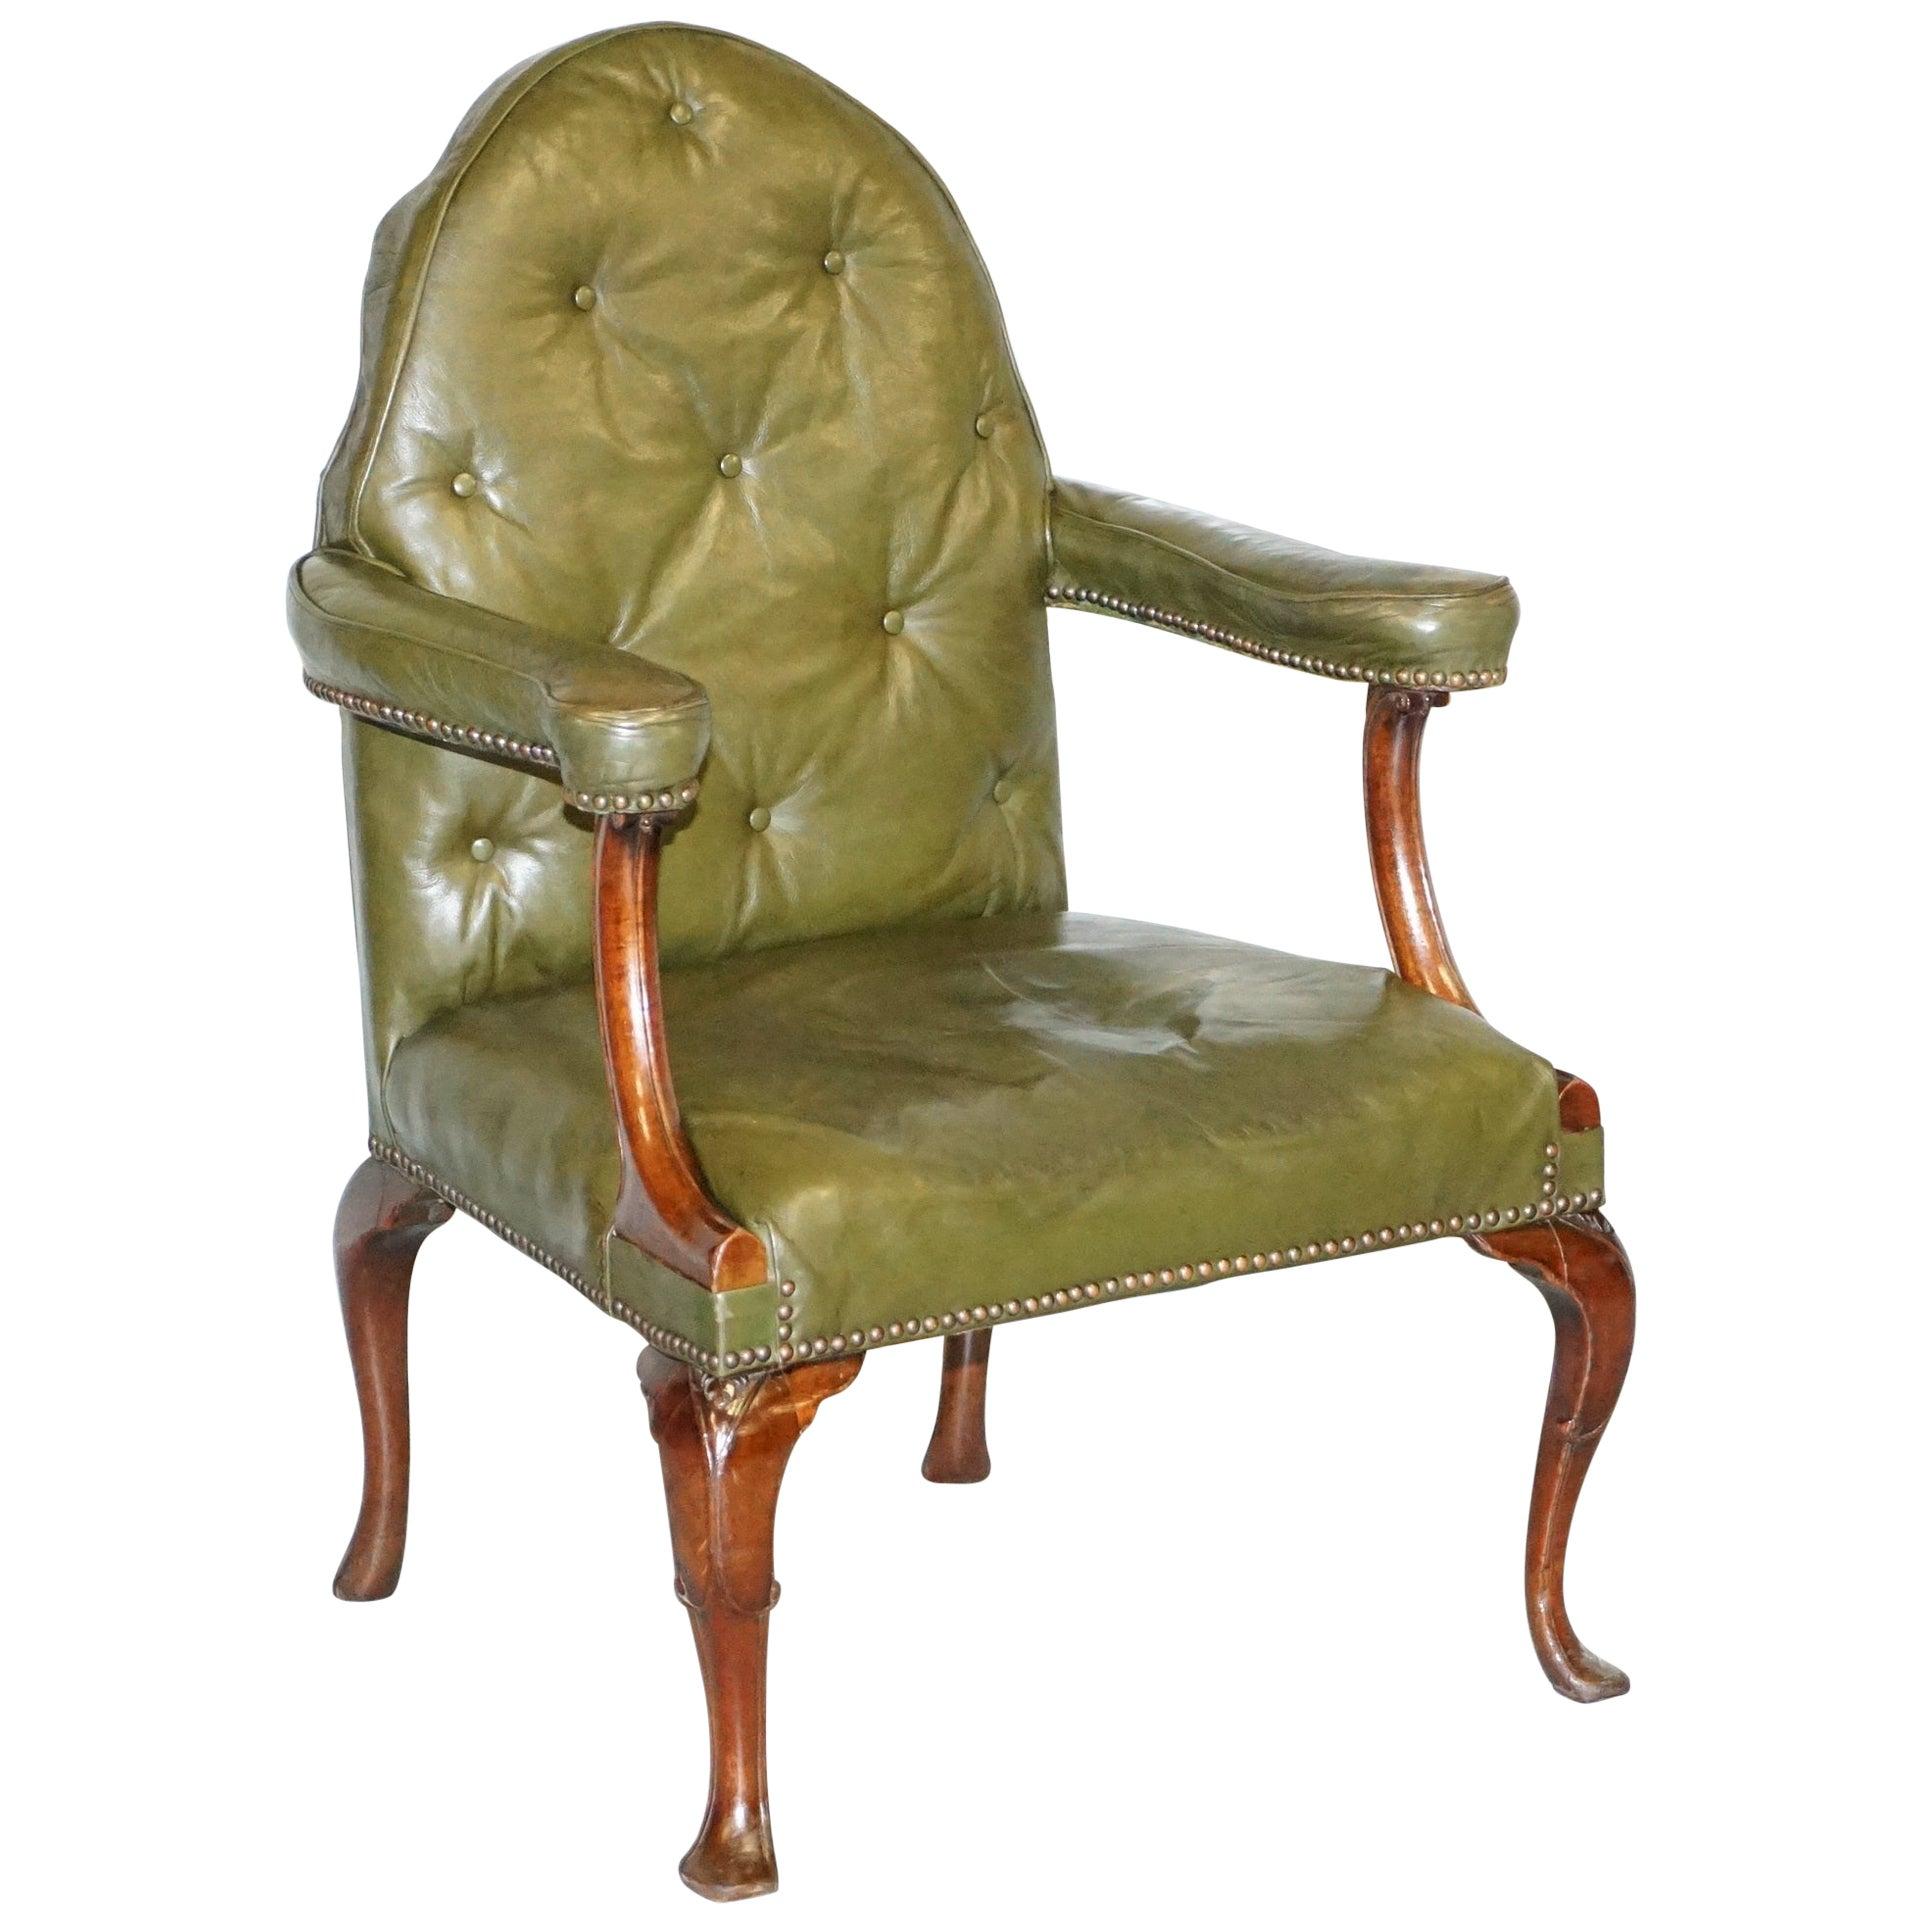 Gothic Revival Georgian Irish Chesterfield Leather Carver Armchair, circa 1800